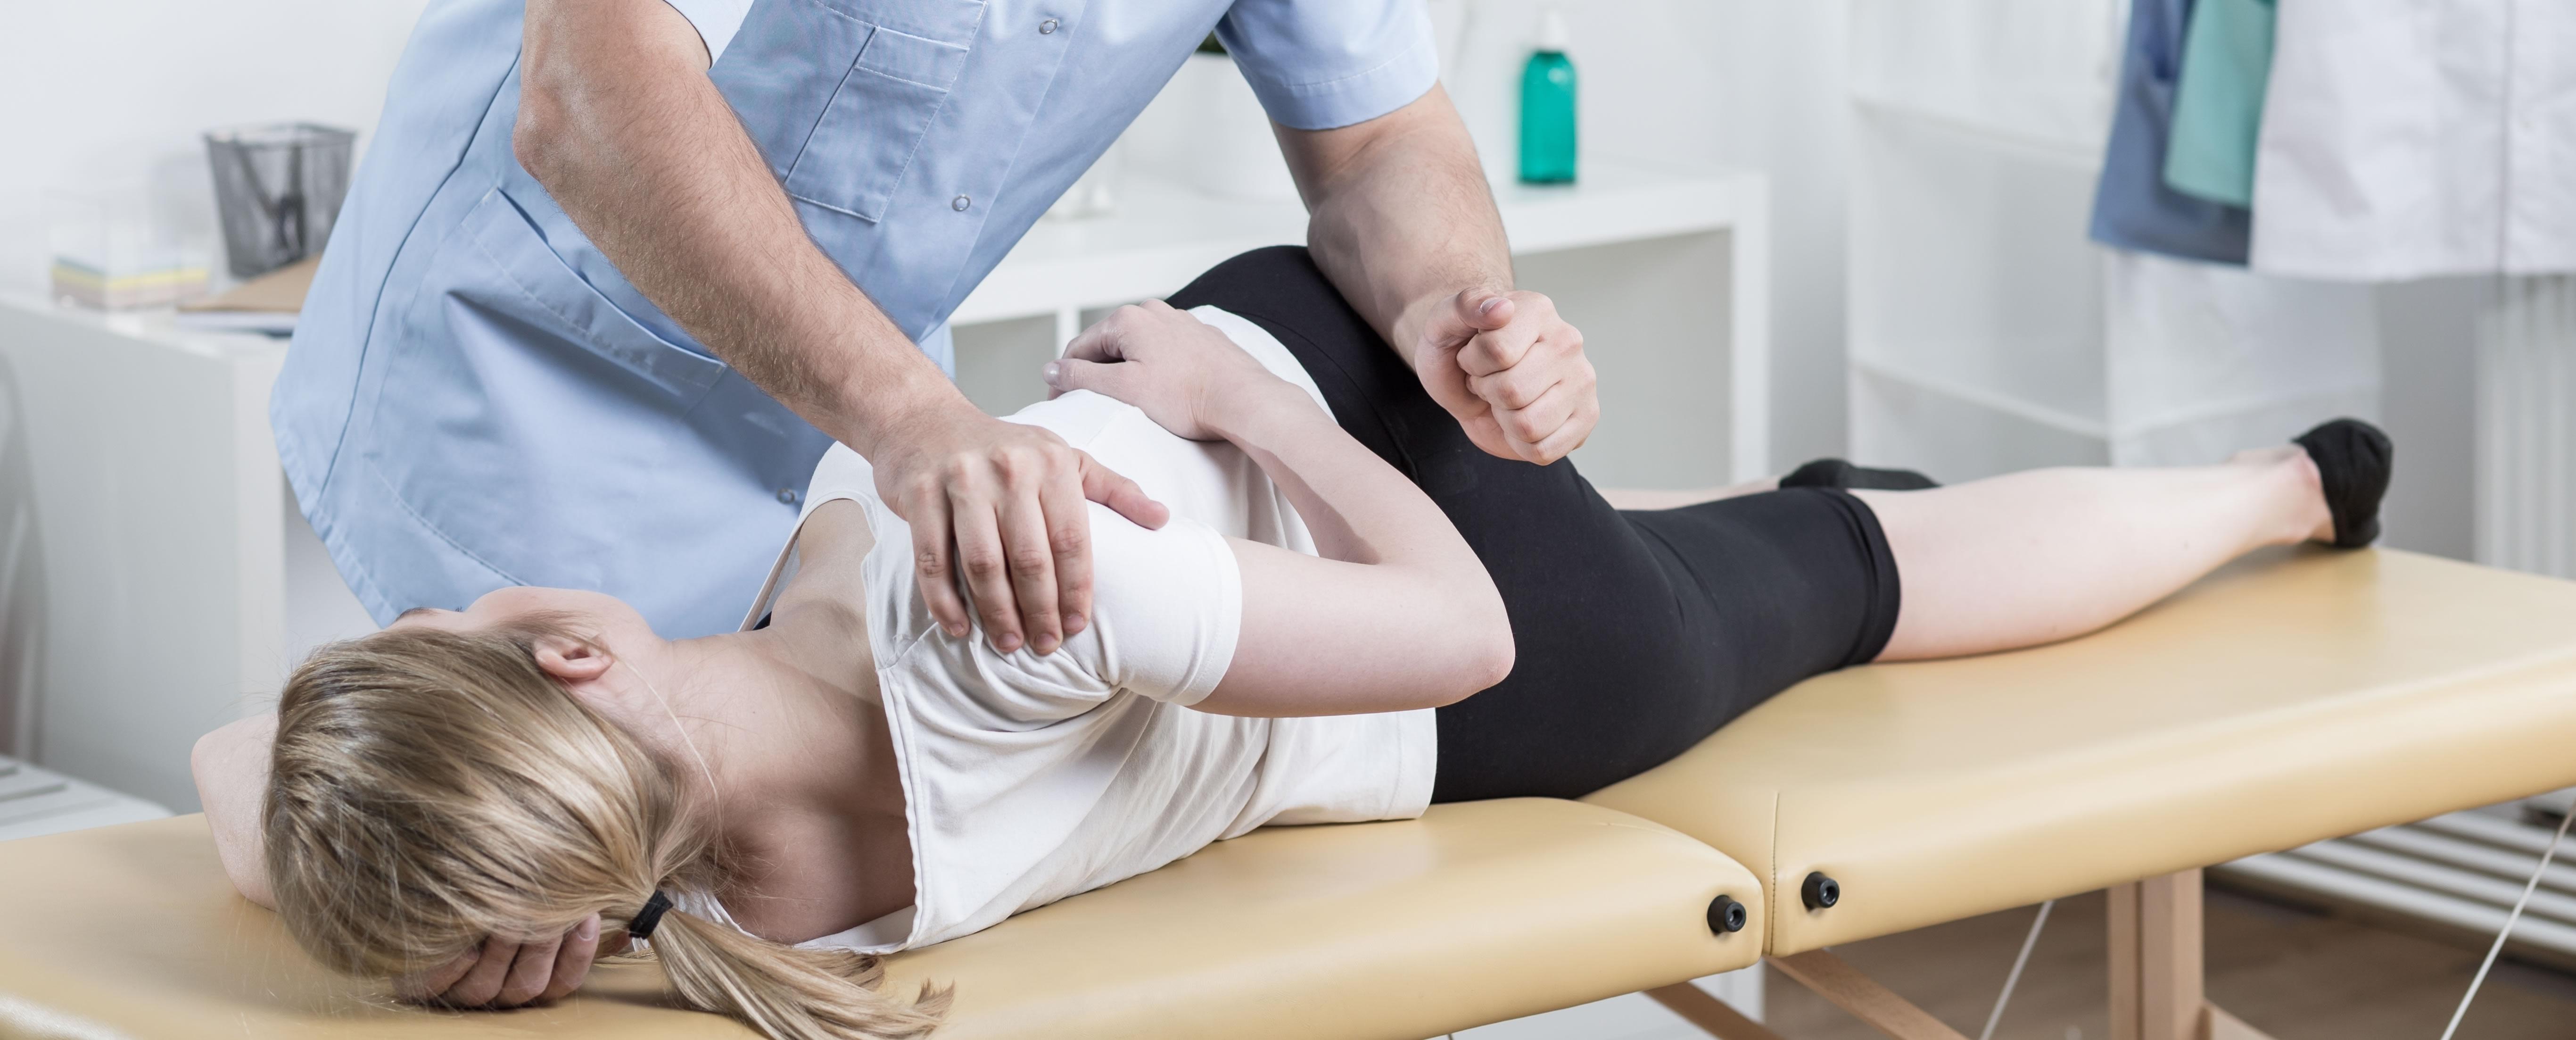 chiropractic maneuver